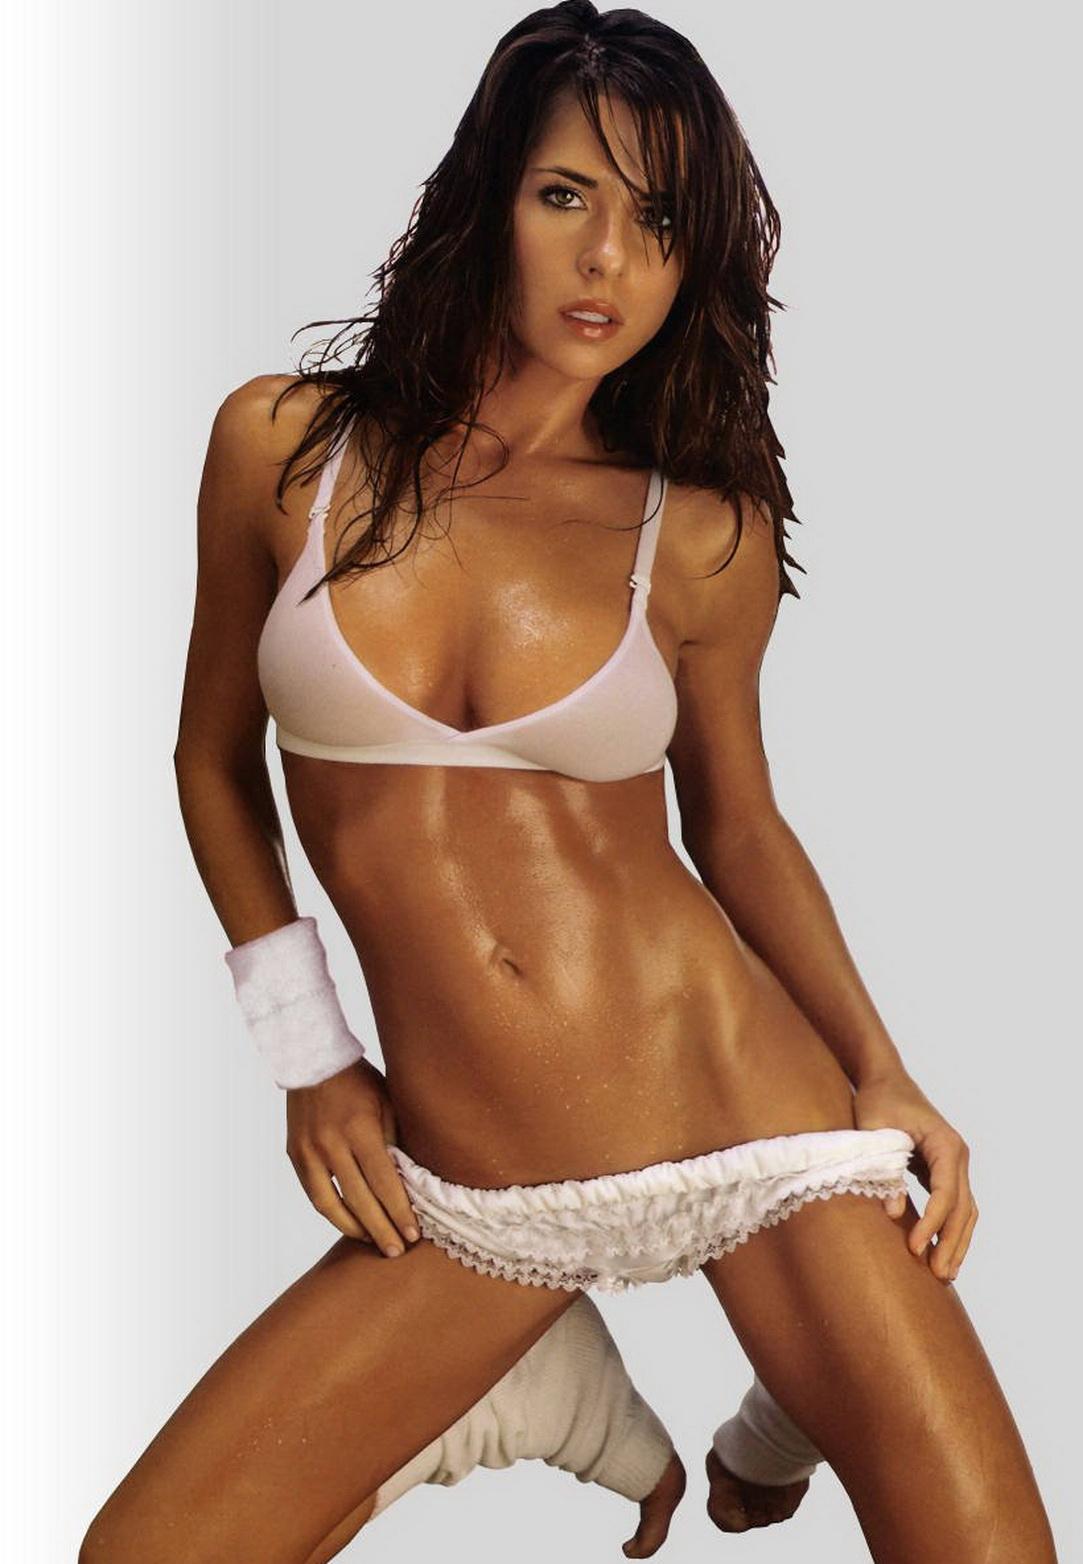 Agree wife webshot bikini right! good